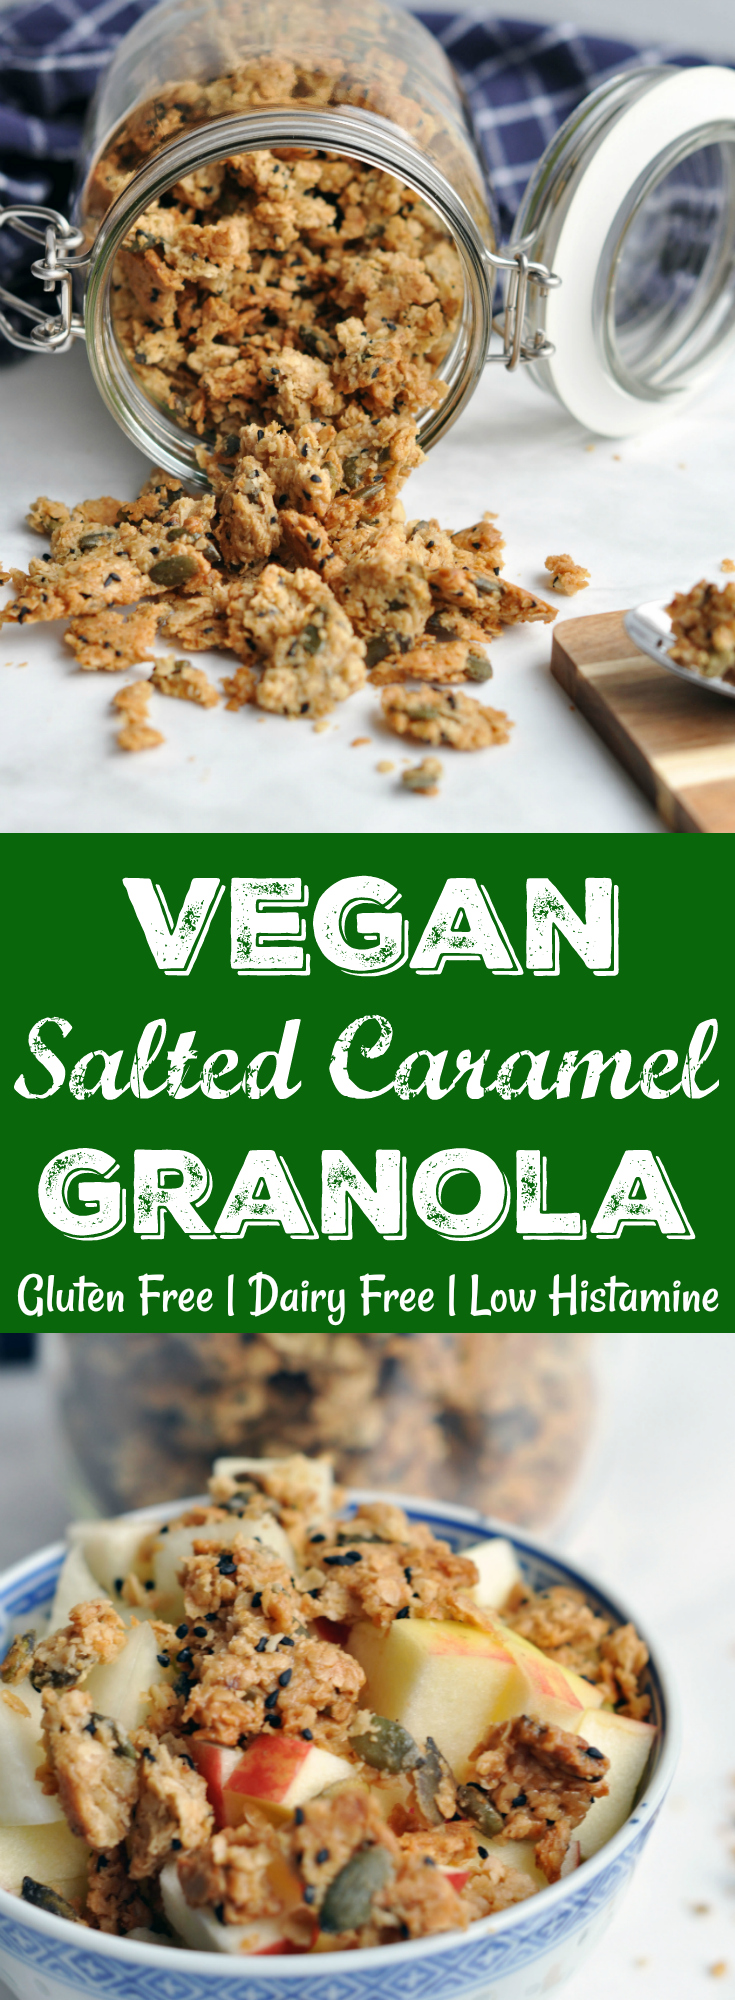 Vegan Salted Caramel Granola - Gluten Free :D